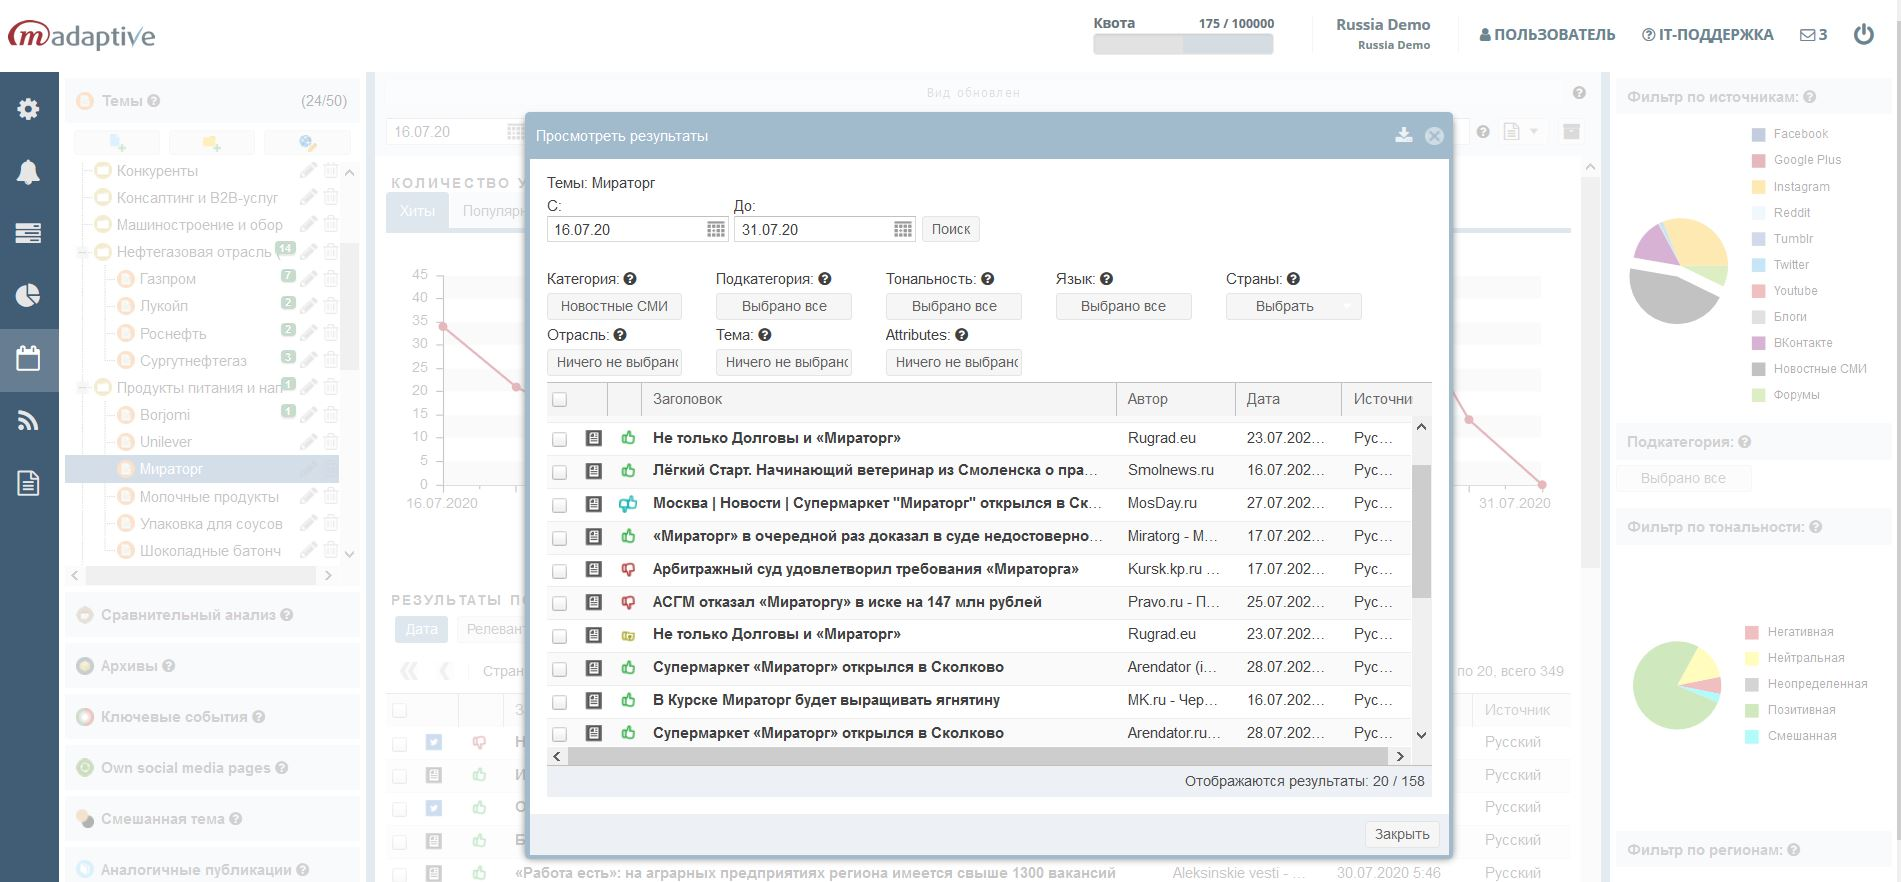 Детальная таблица упоминаний объекта мониторинга по теме в онлайн-сервисе для аналитики СМИ M-Adaptive